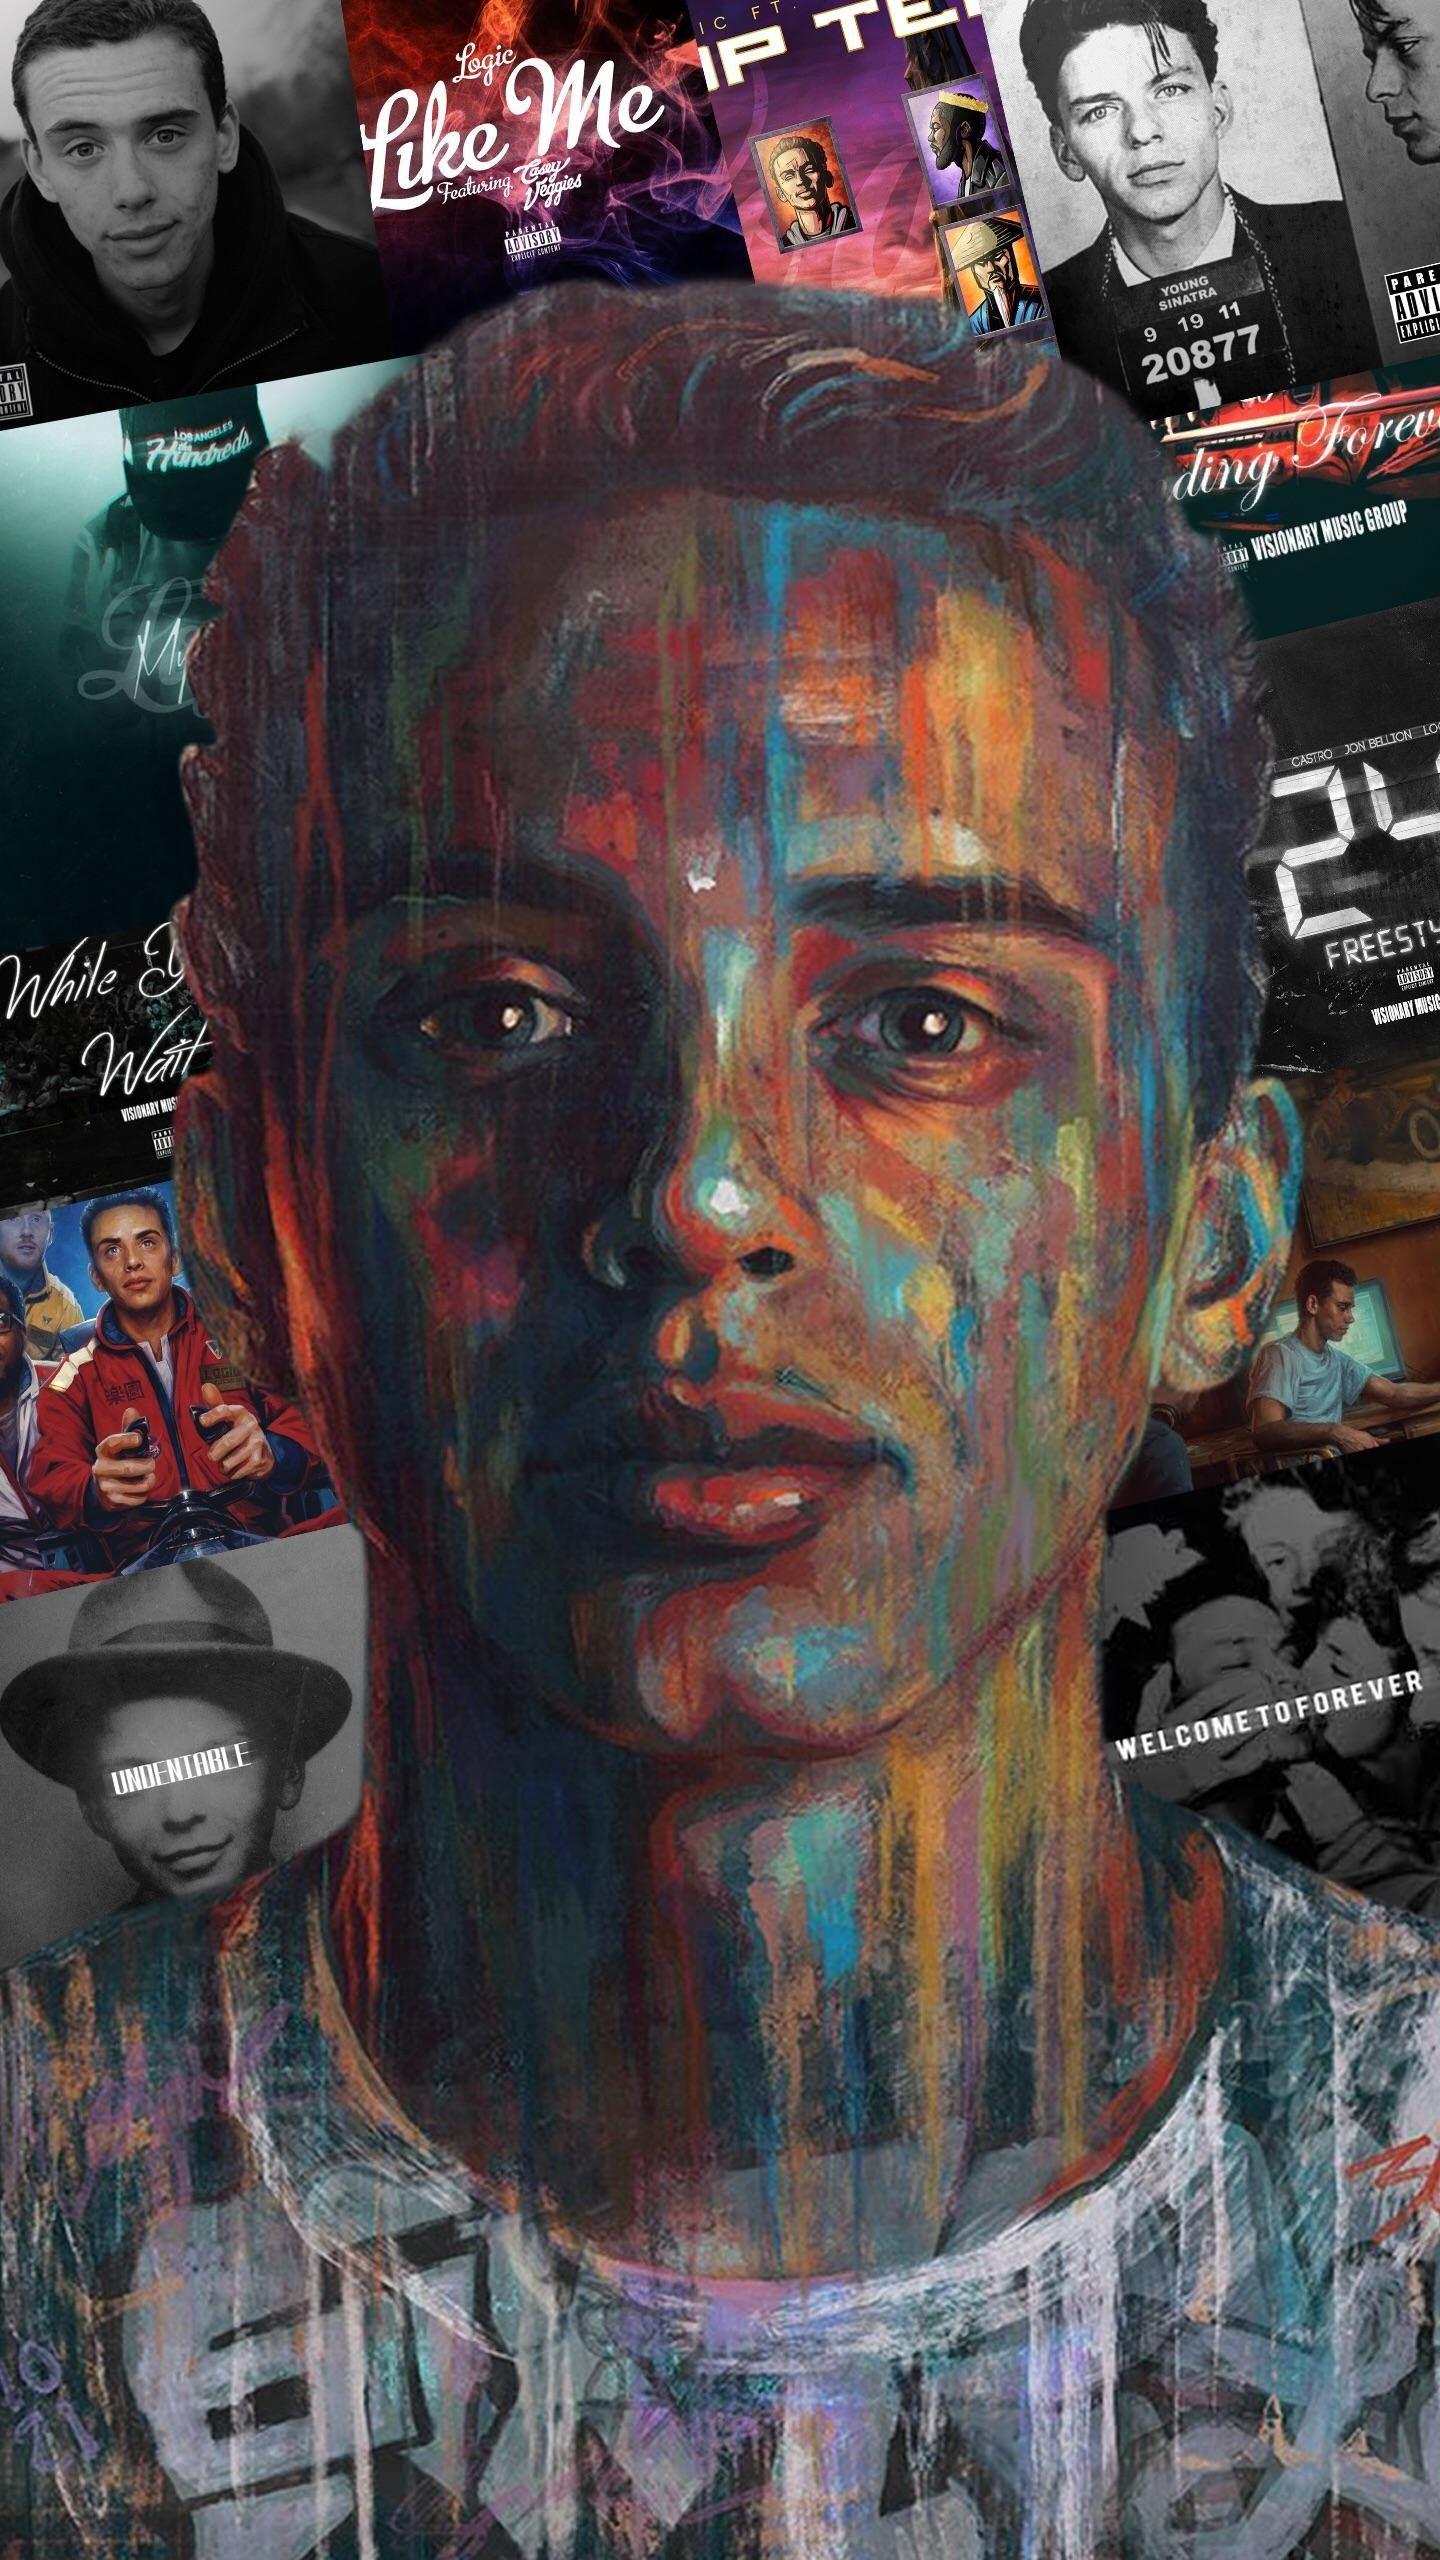 1440x2560 Cool wallpaper Logic rapper wallpaper